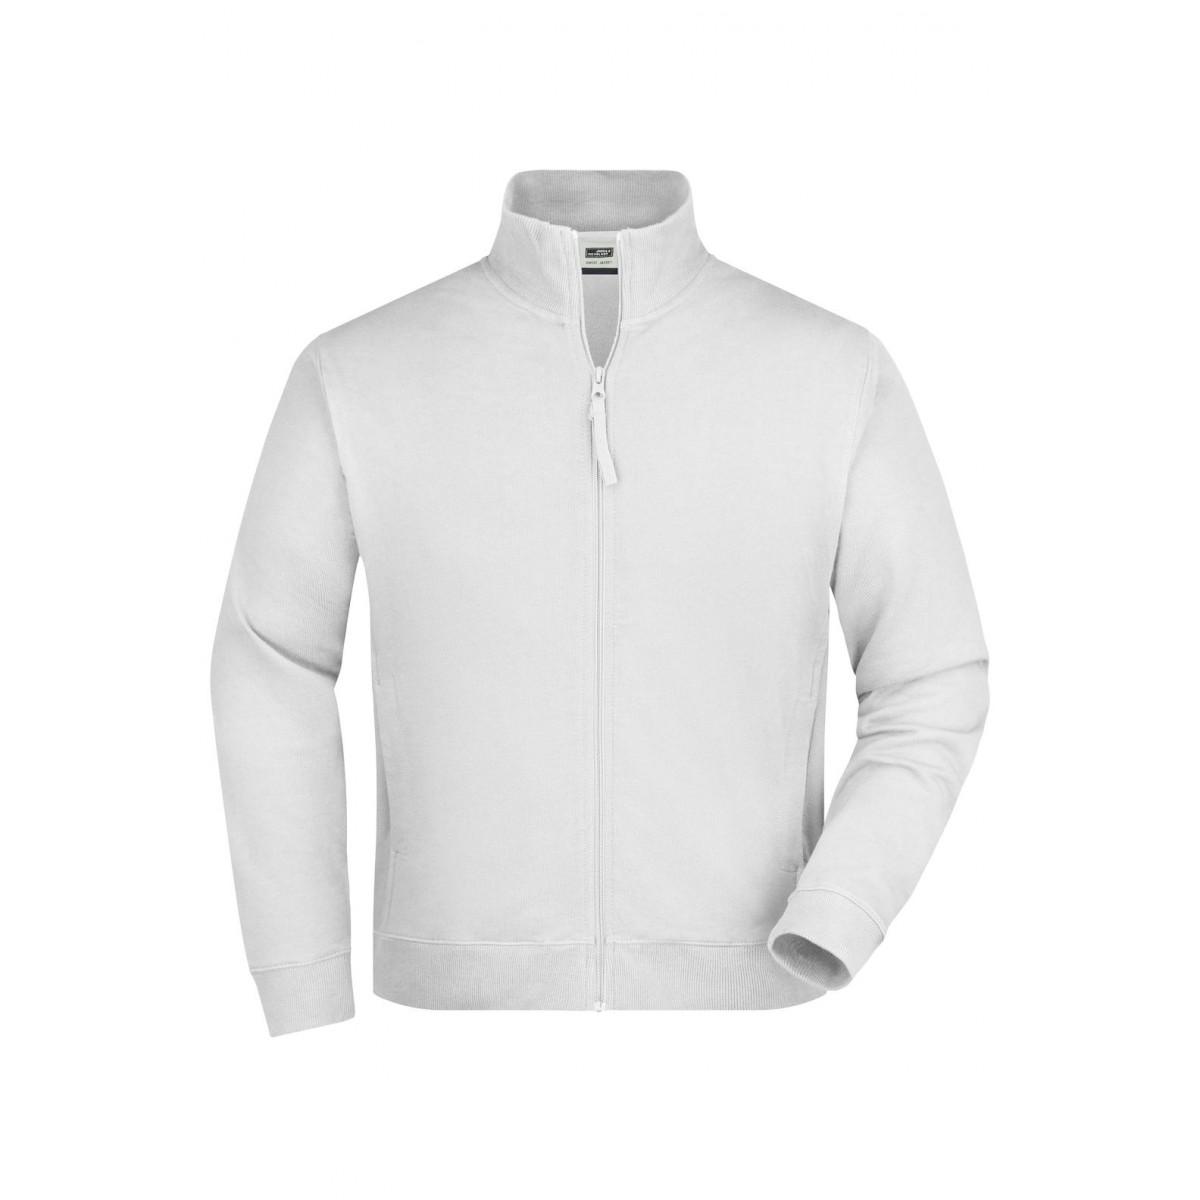 Толстовка мужская JN058 Sweat Jacket - Белый